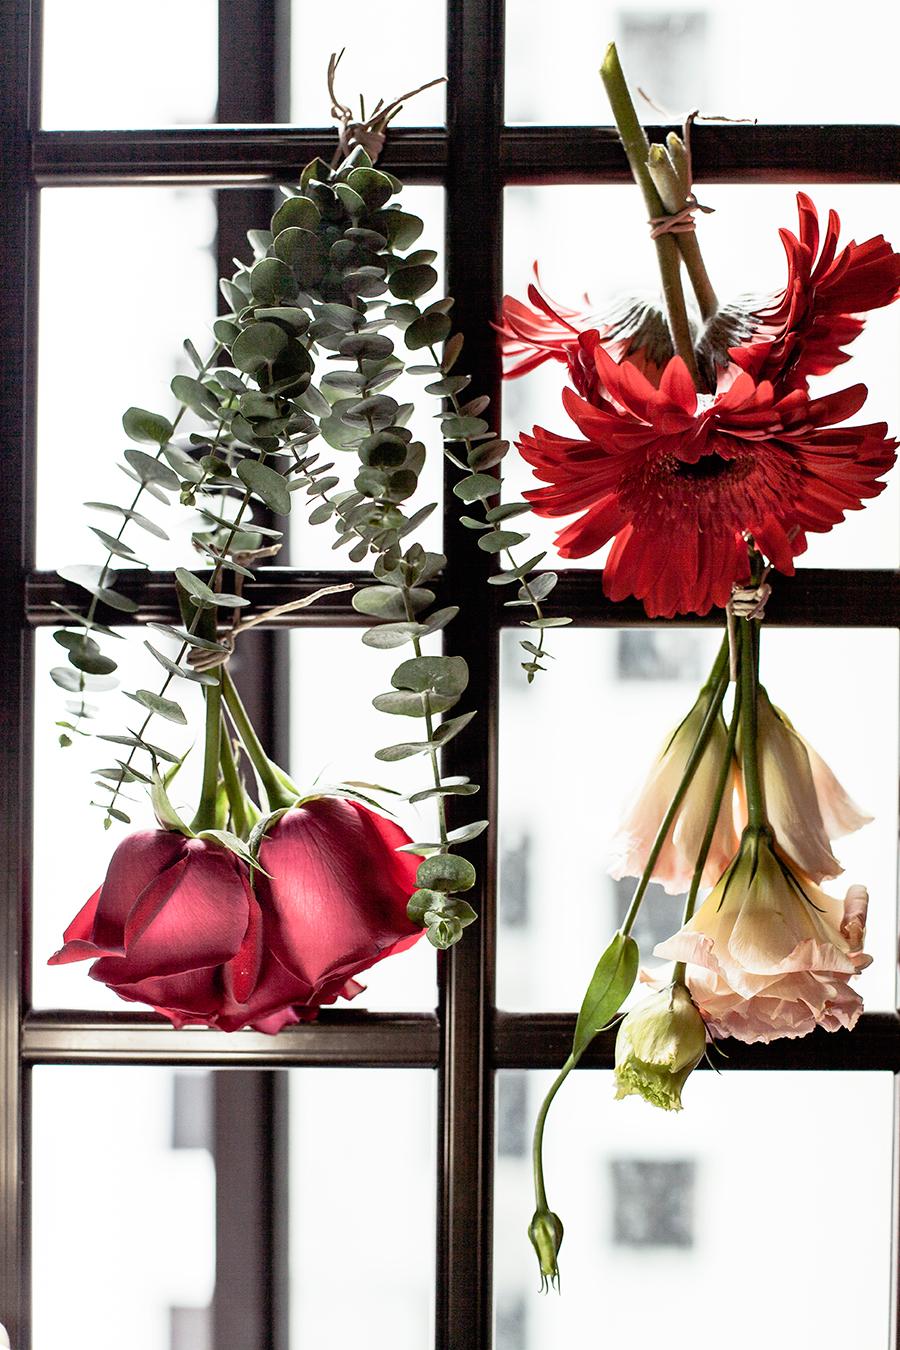 Flowers from the Floral Garage SG Fruit Hamper - Roses, Eustoma, Gerbera, Eucalyptus leaves.